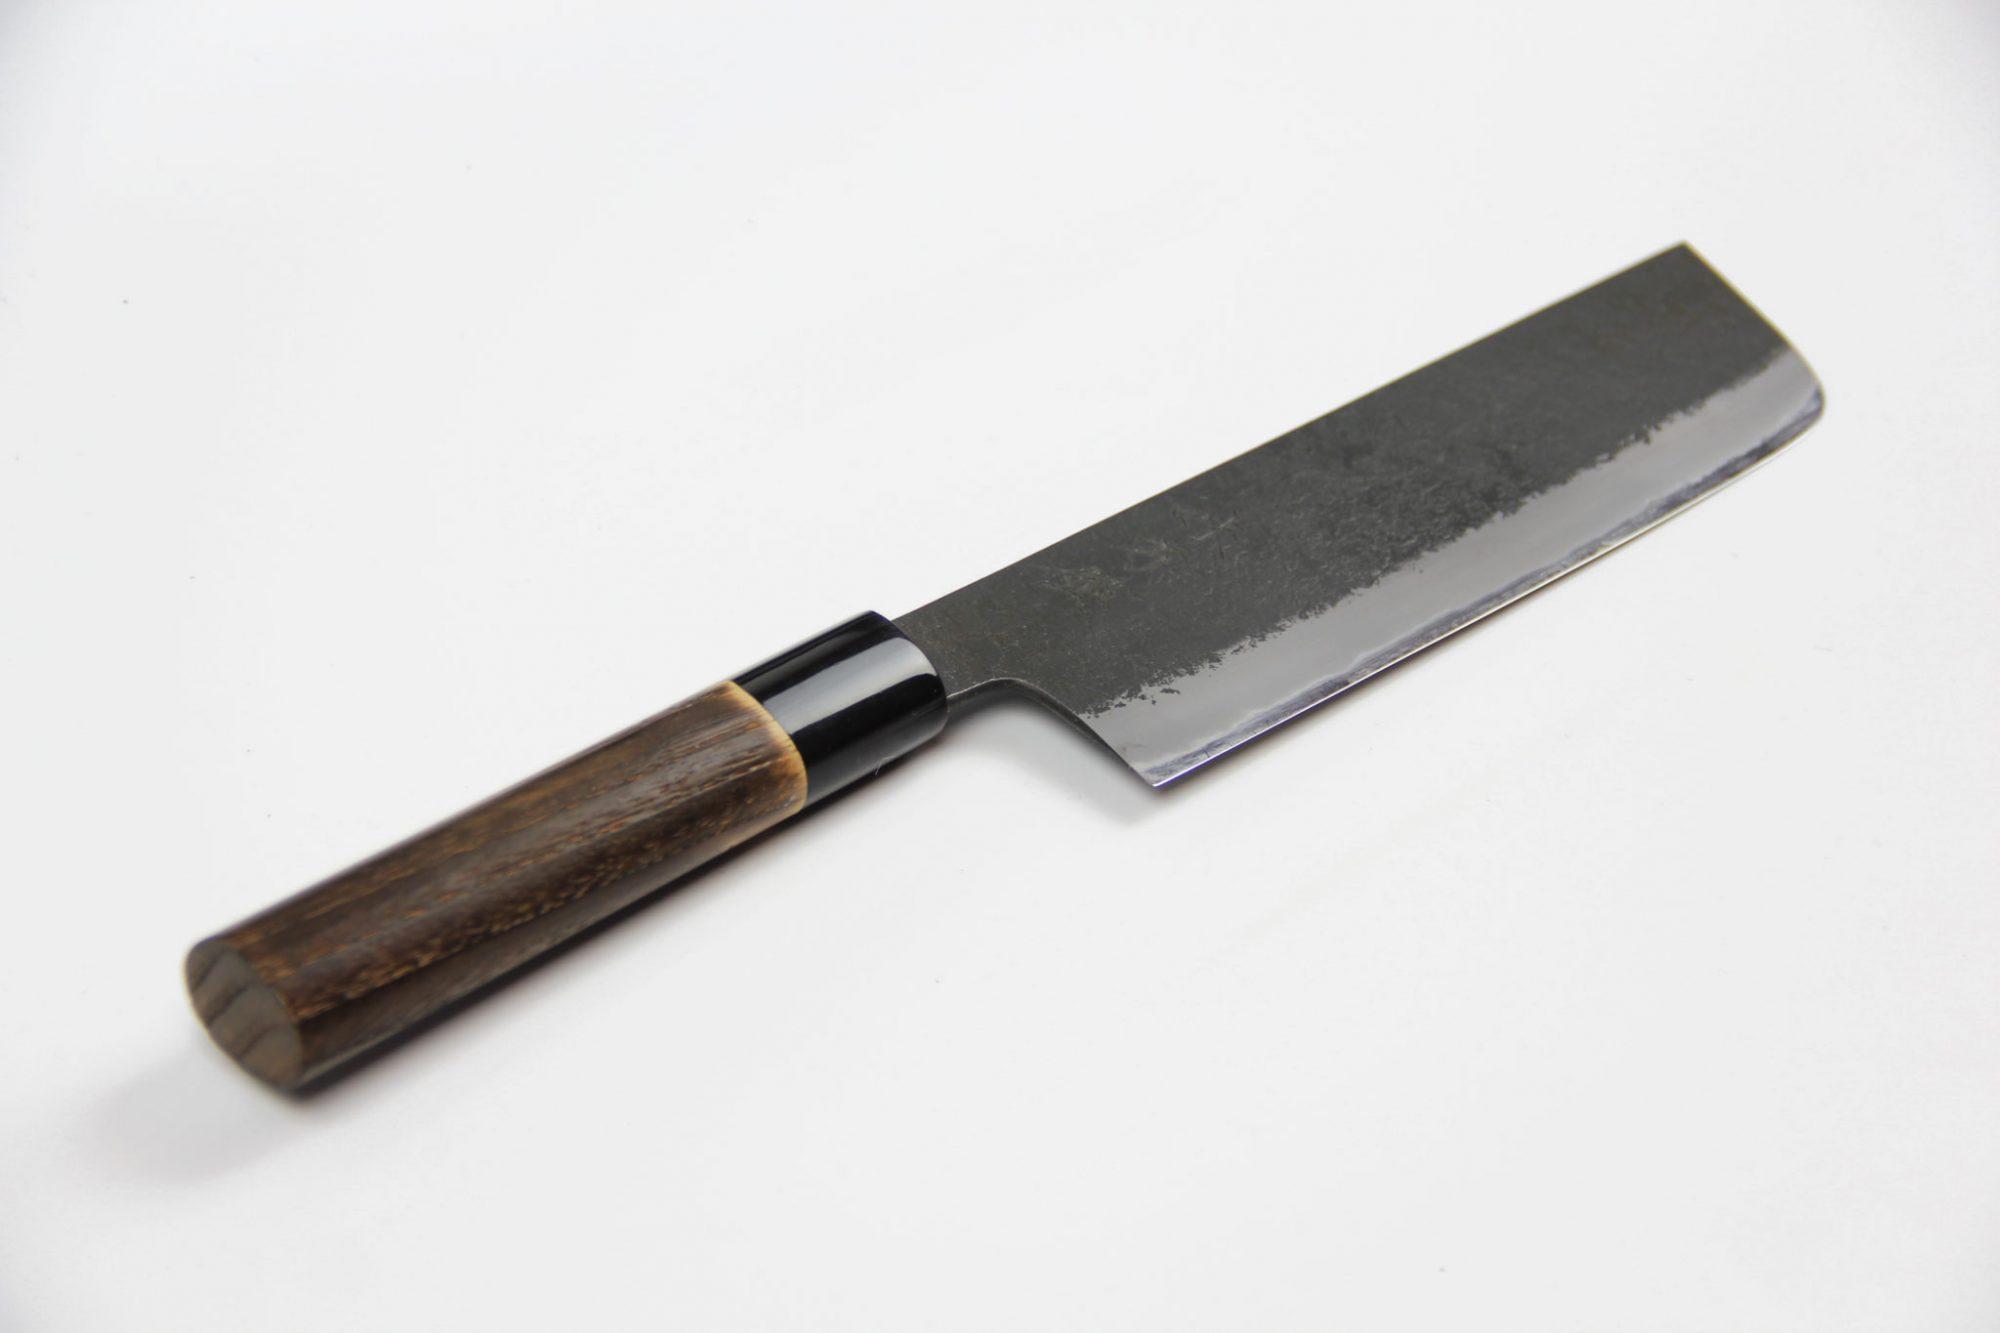 Mutsumi Hinoura Nashiji Nakiri 180mm Shirogami Iron Clad 2